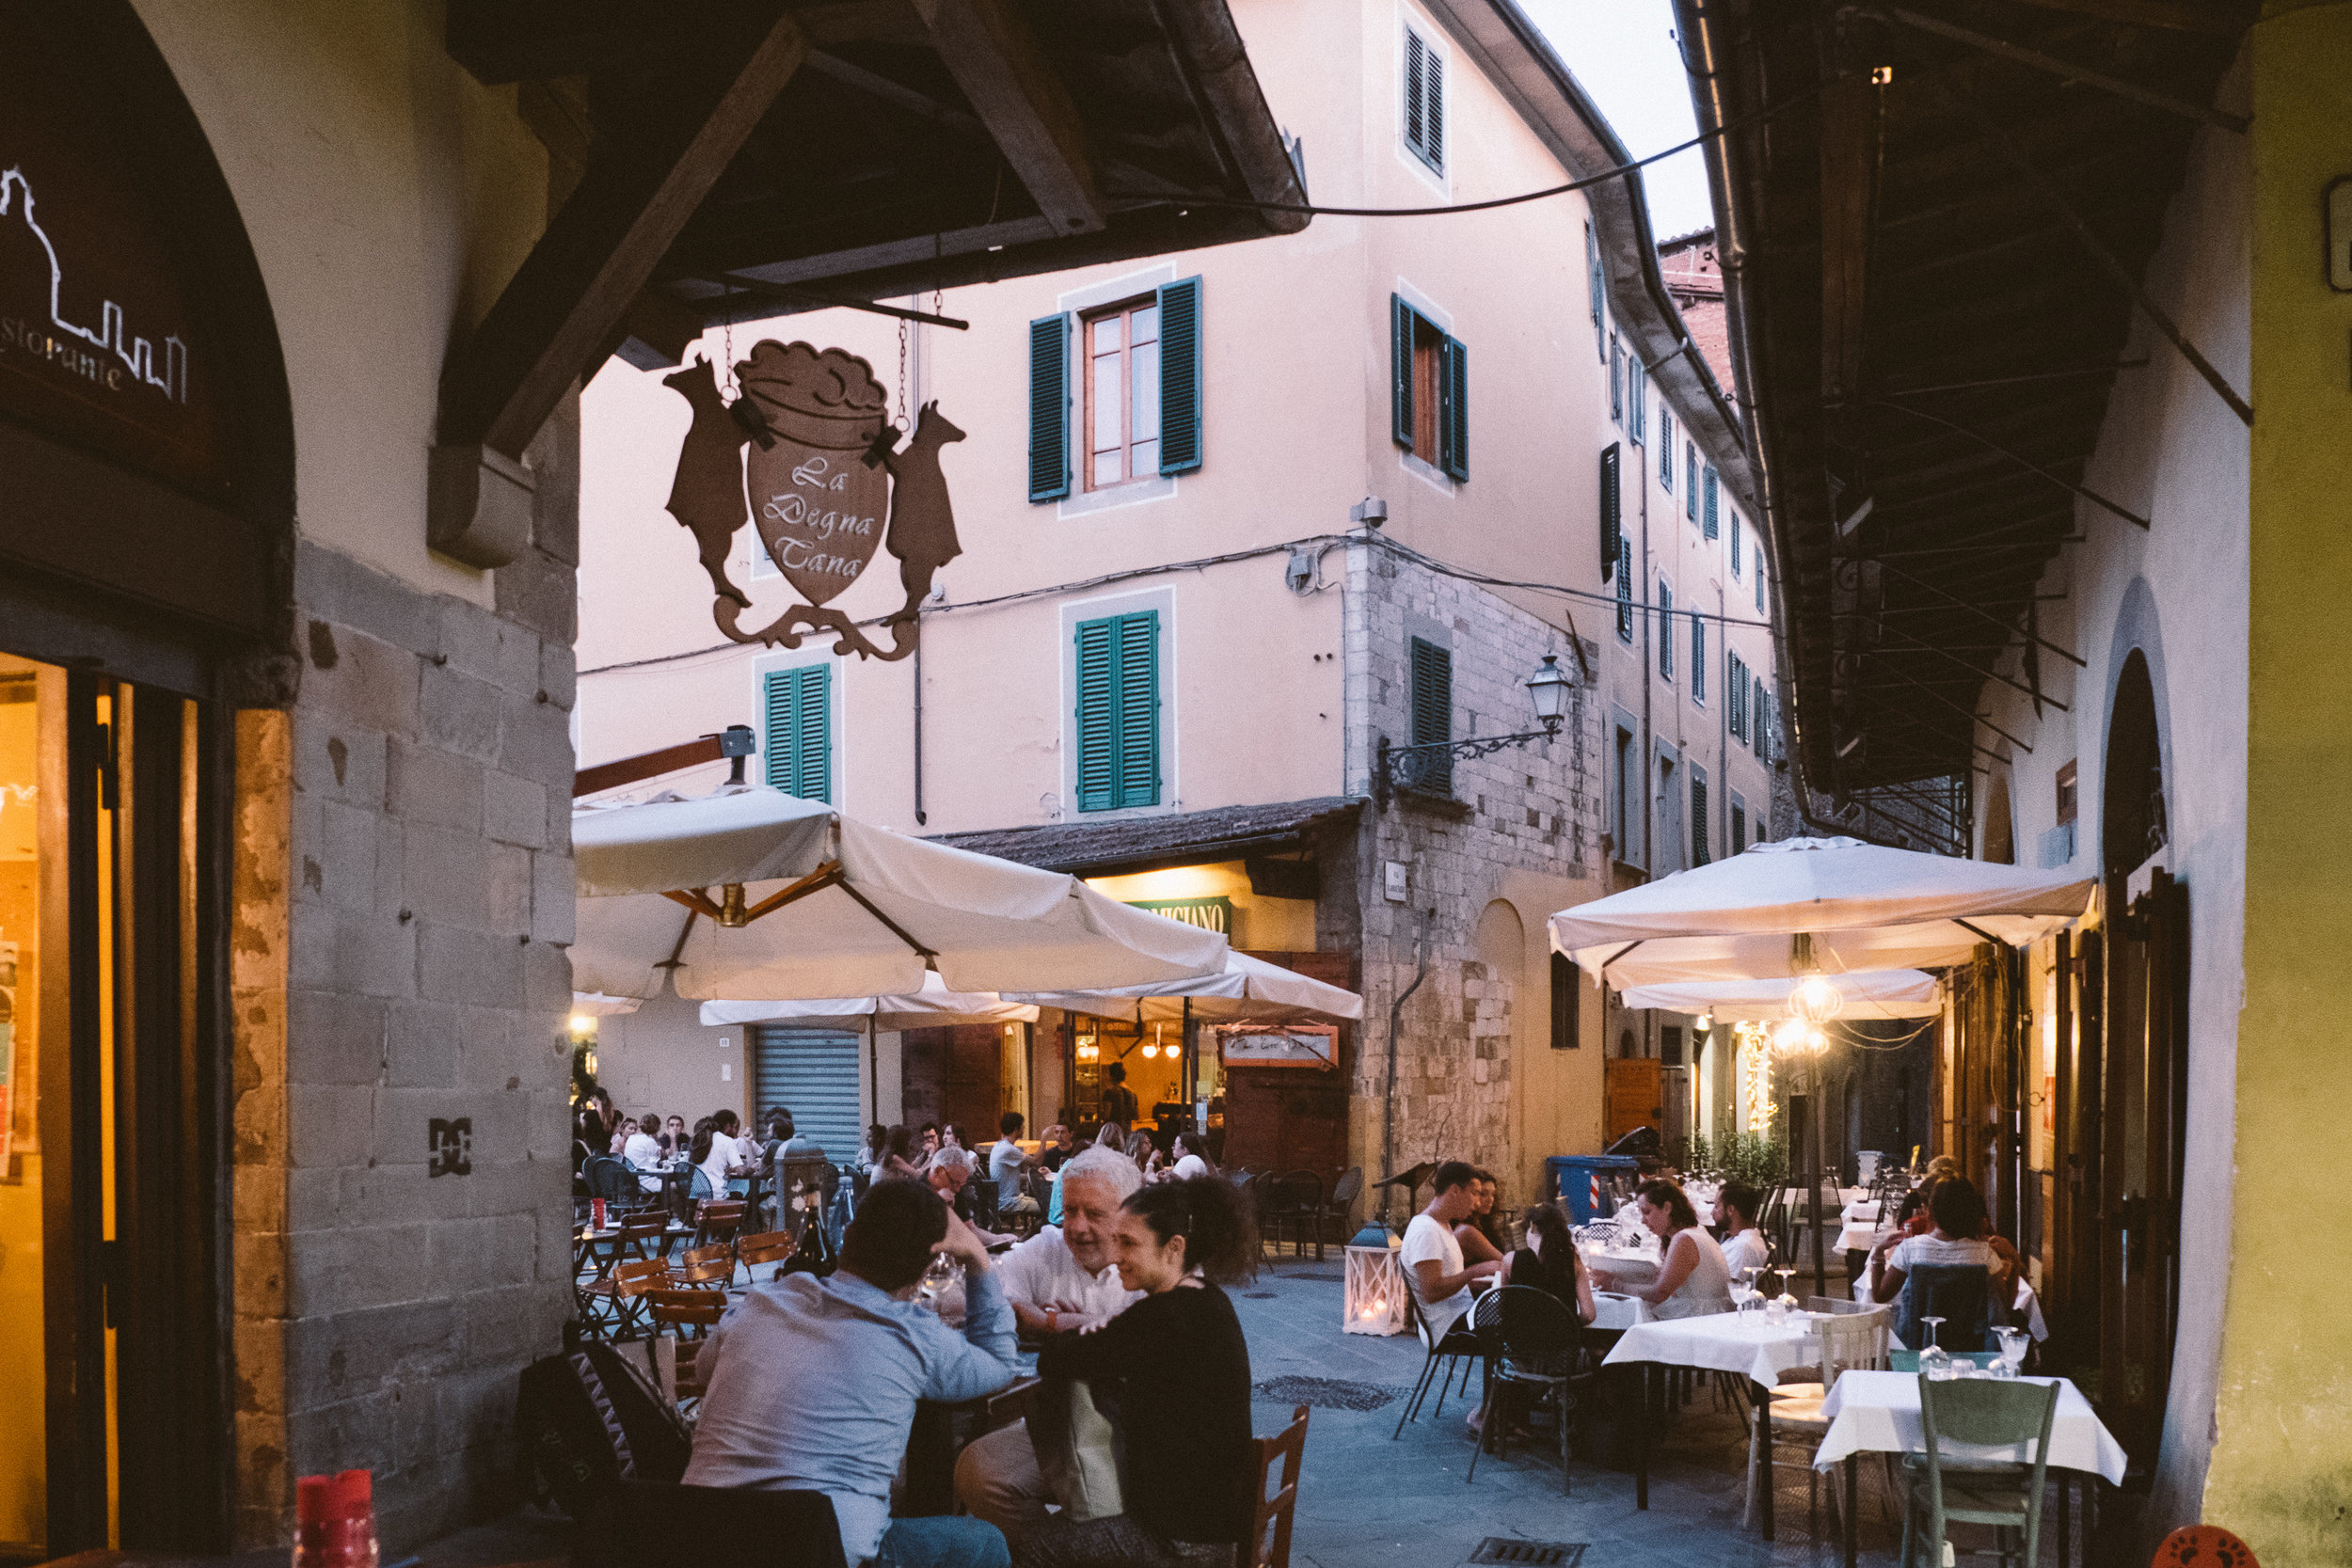 fat-creative-travel-blog-pistoia-italian-capital-of-culture-2017-27.jpg